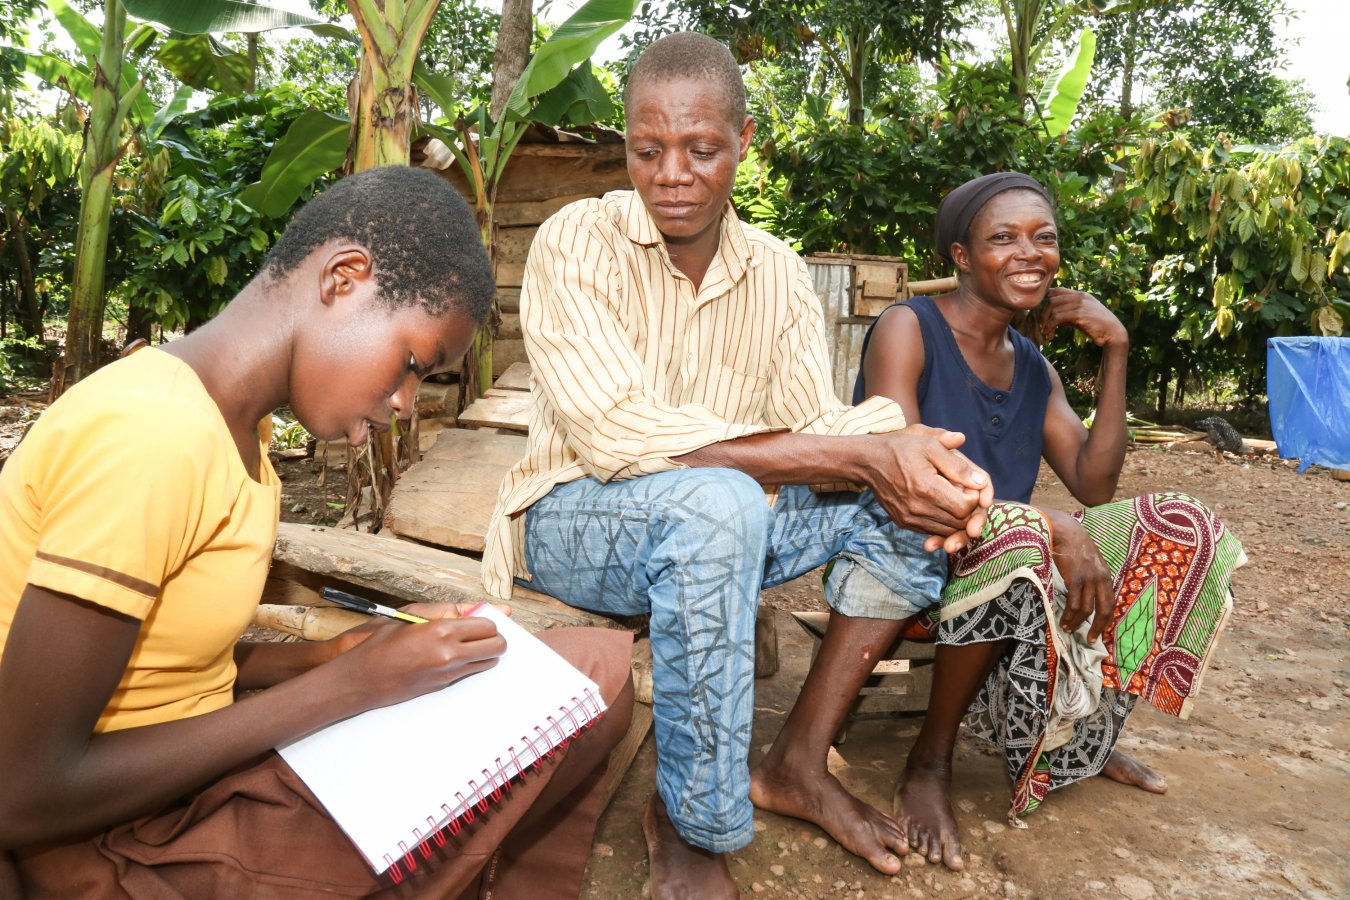 Ghana_FSP_Kumasi_Tom Maruko_Christie writing her dad's name in the book(10)(2)